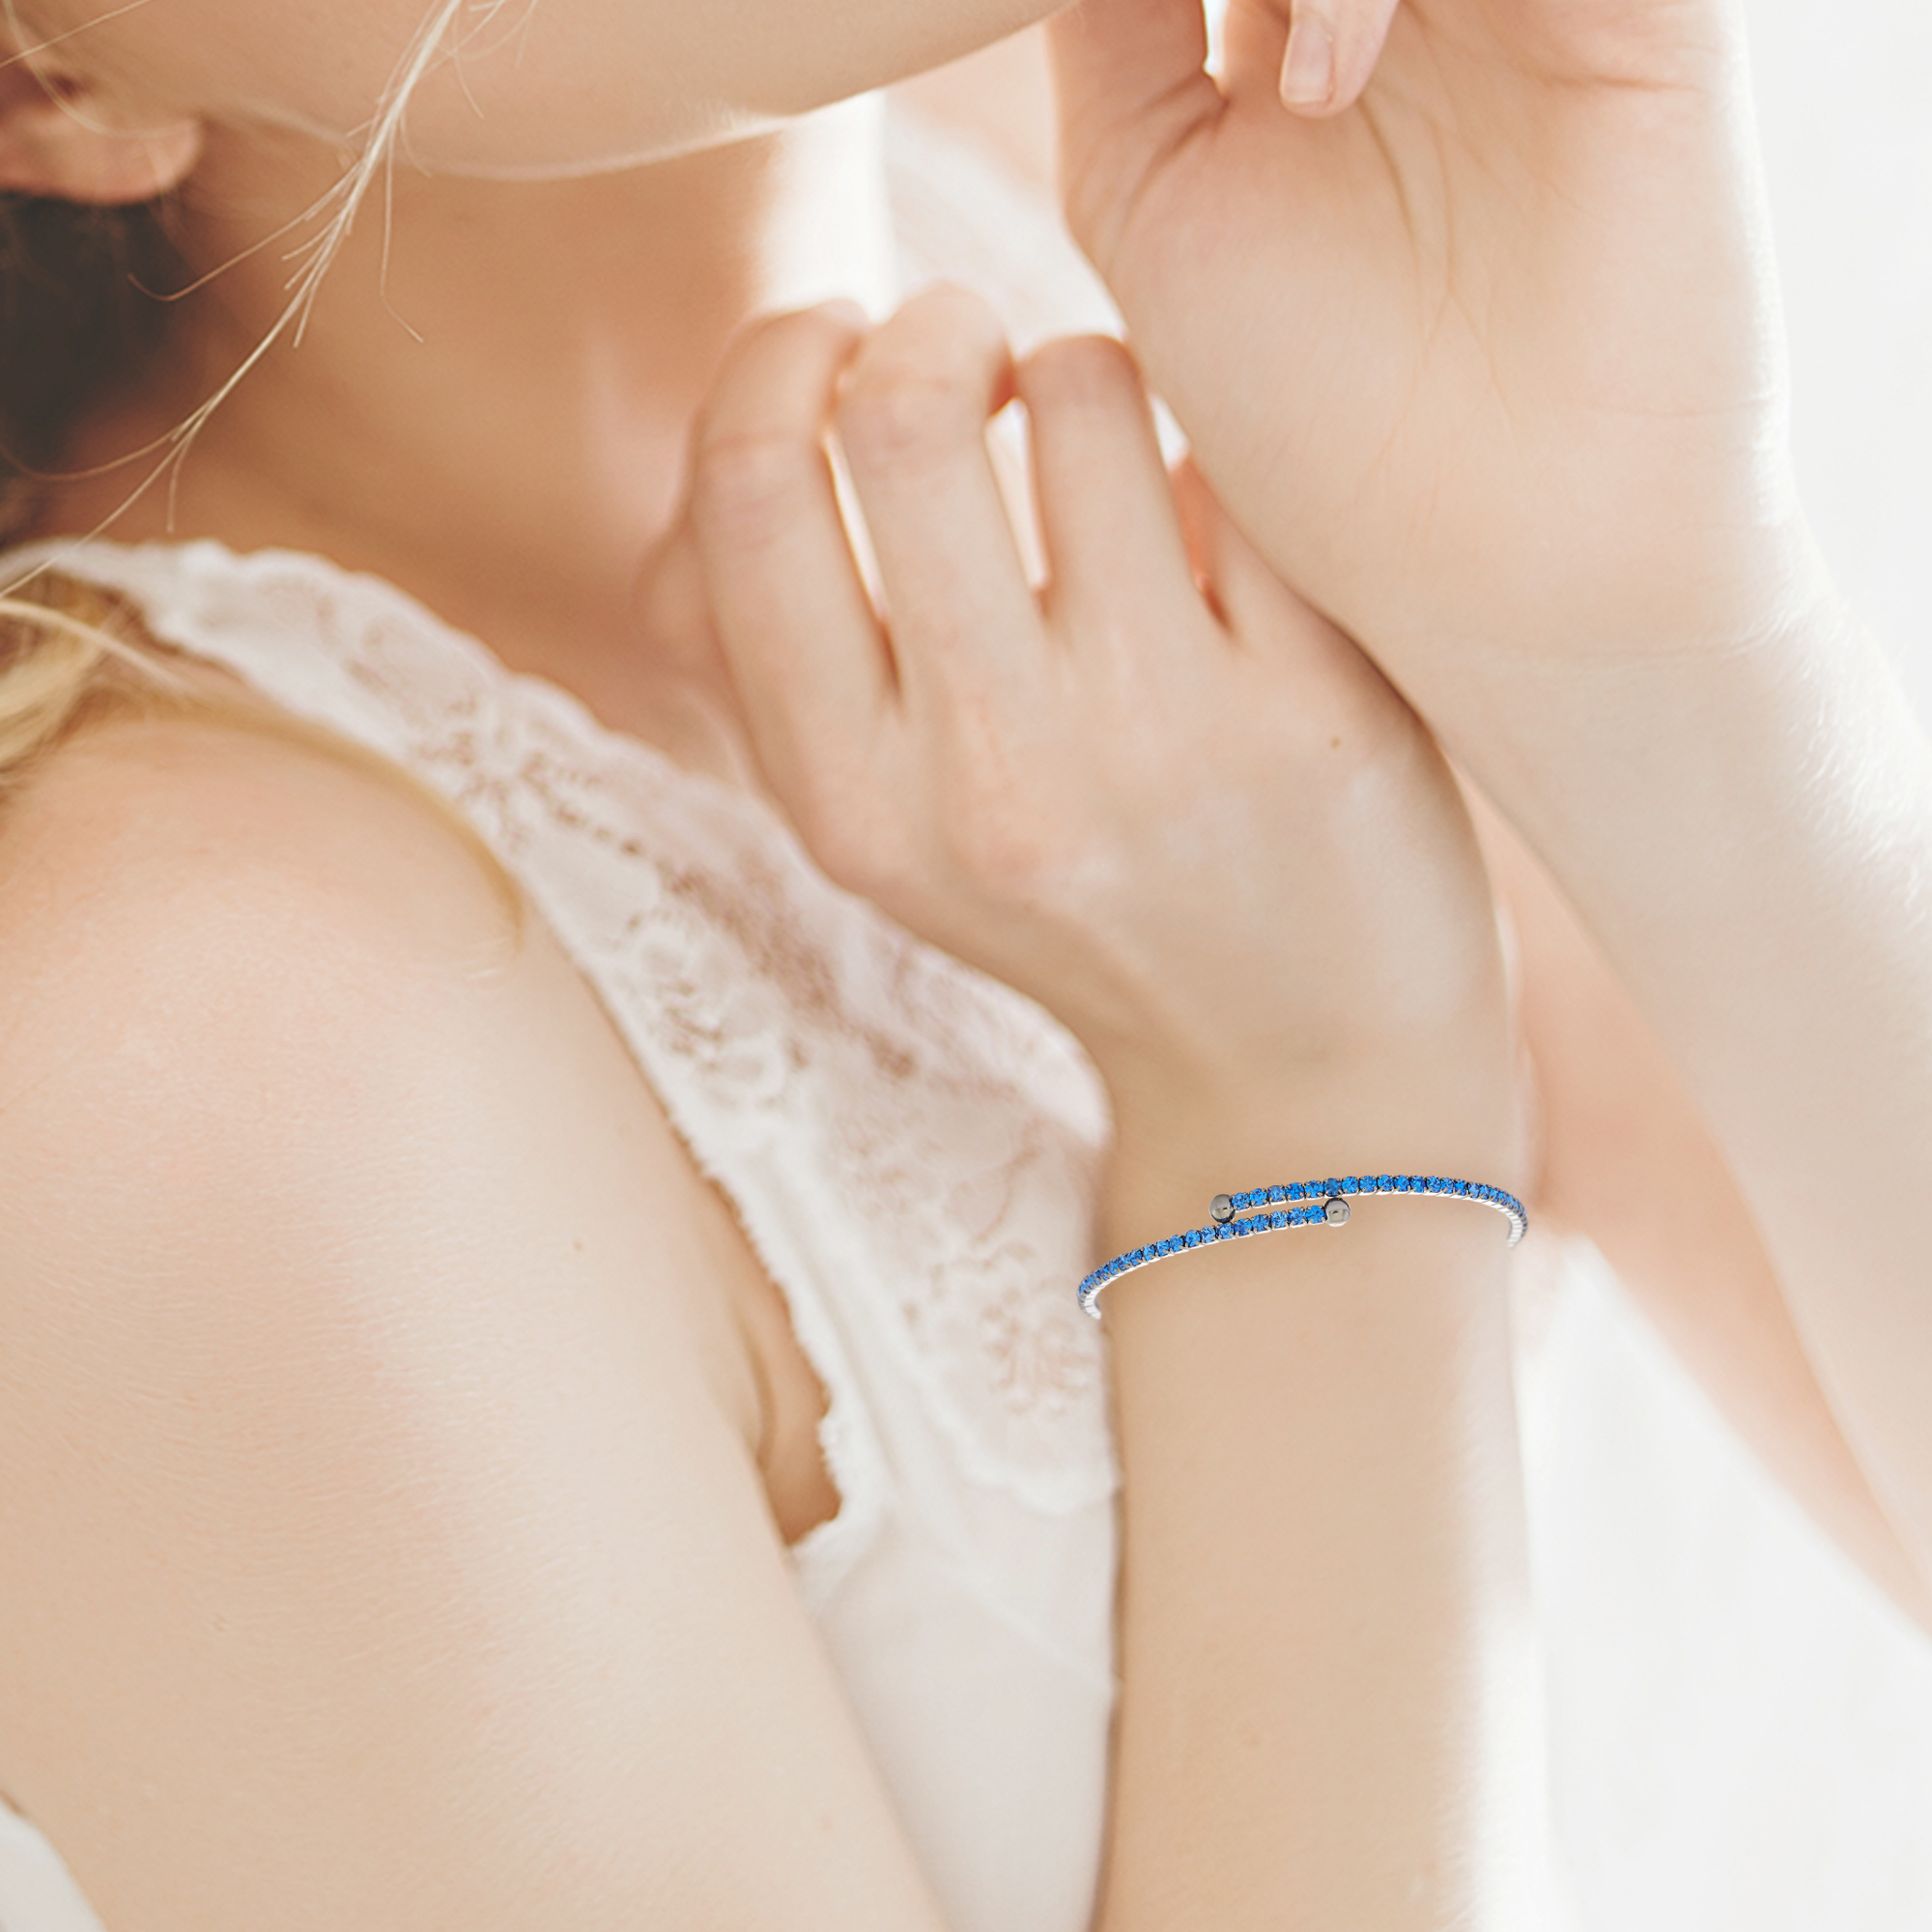 Womens-Ladies-Fashion-Accessories-Jewelry-Black-Rhodium-Plated-Bangle-Bracelet thumbnail 38